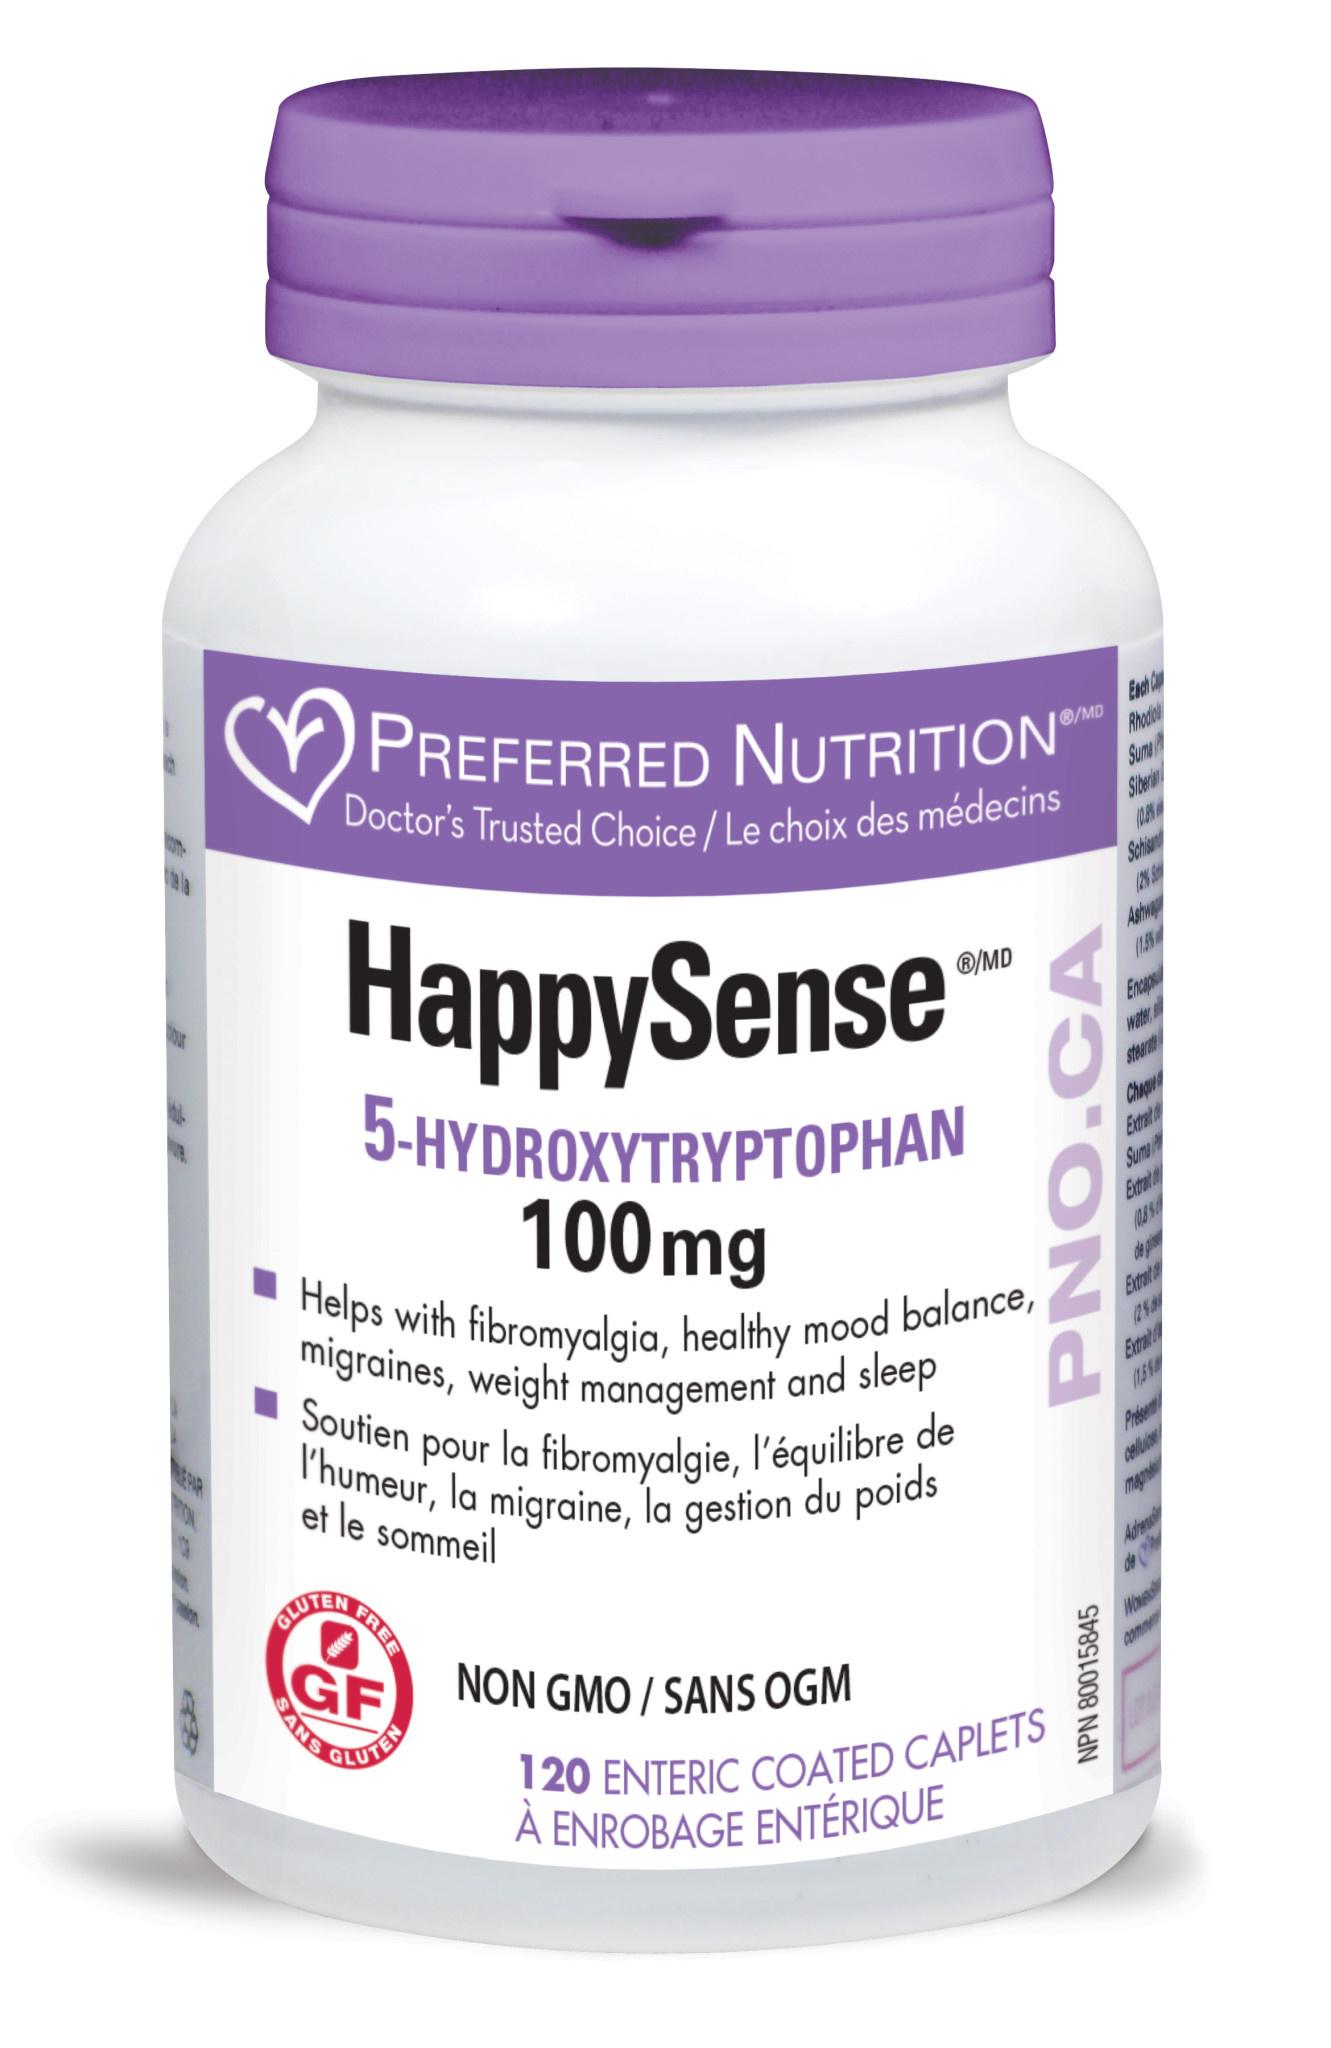 Preferred Nutrition Preferred Nutrition - HappySense - 100mg -120 EC Caplets